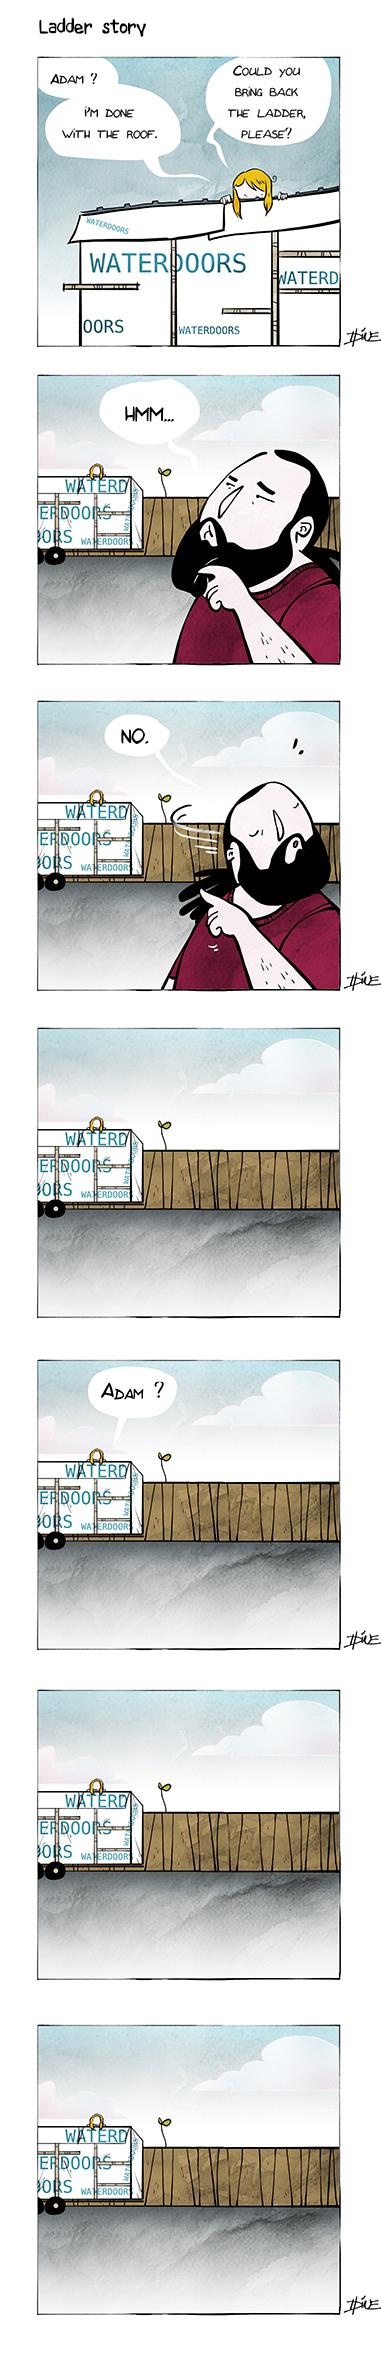 007 ladder web